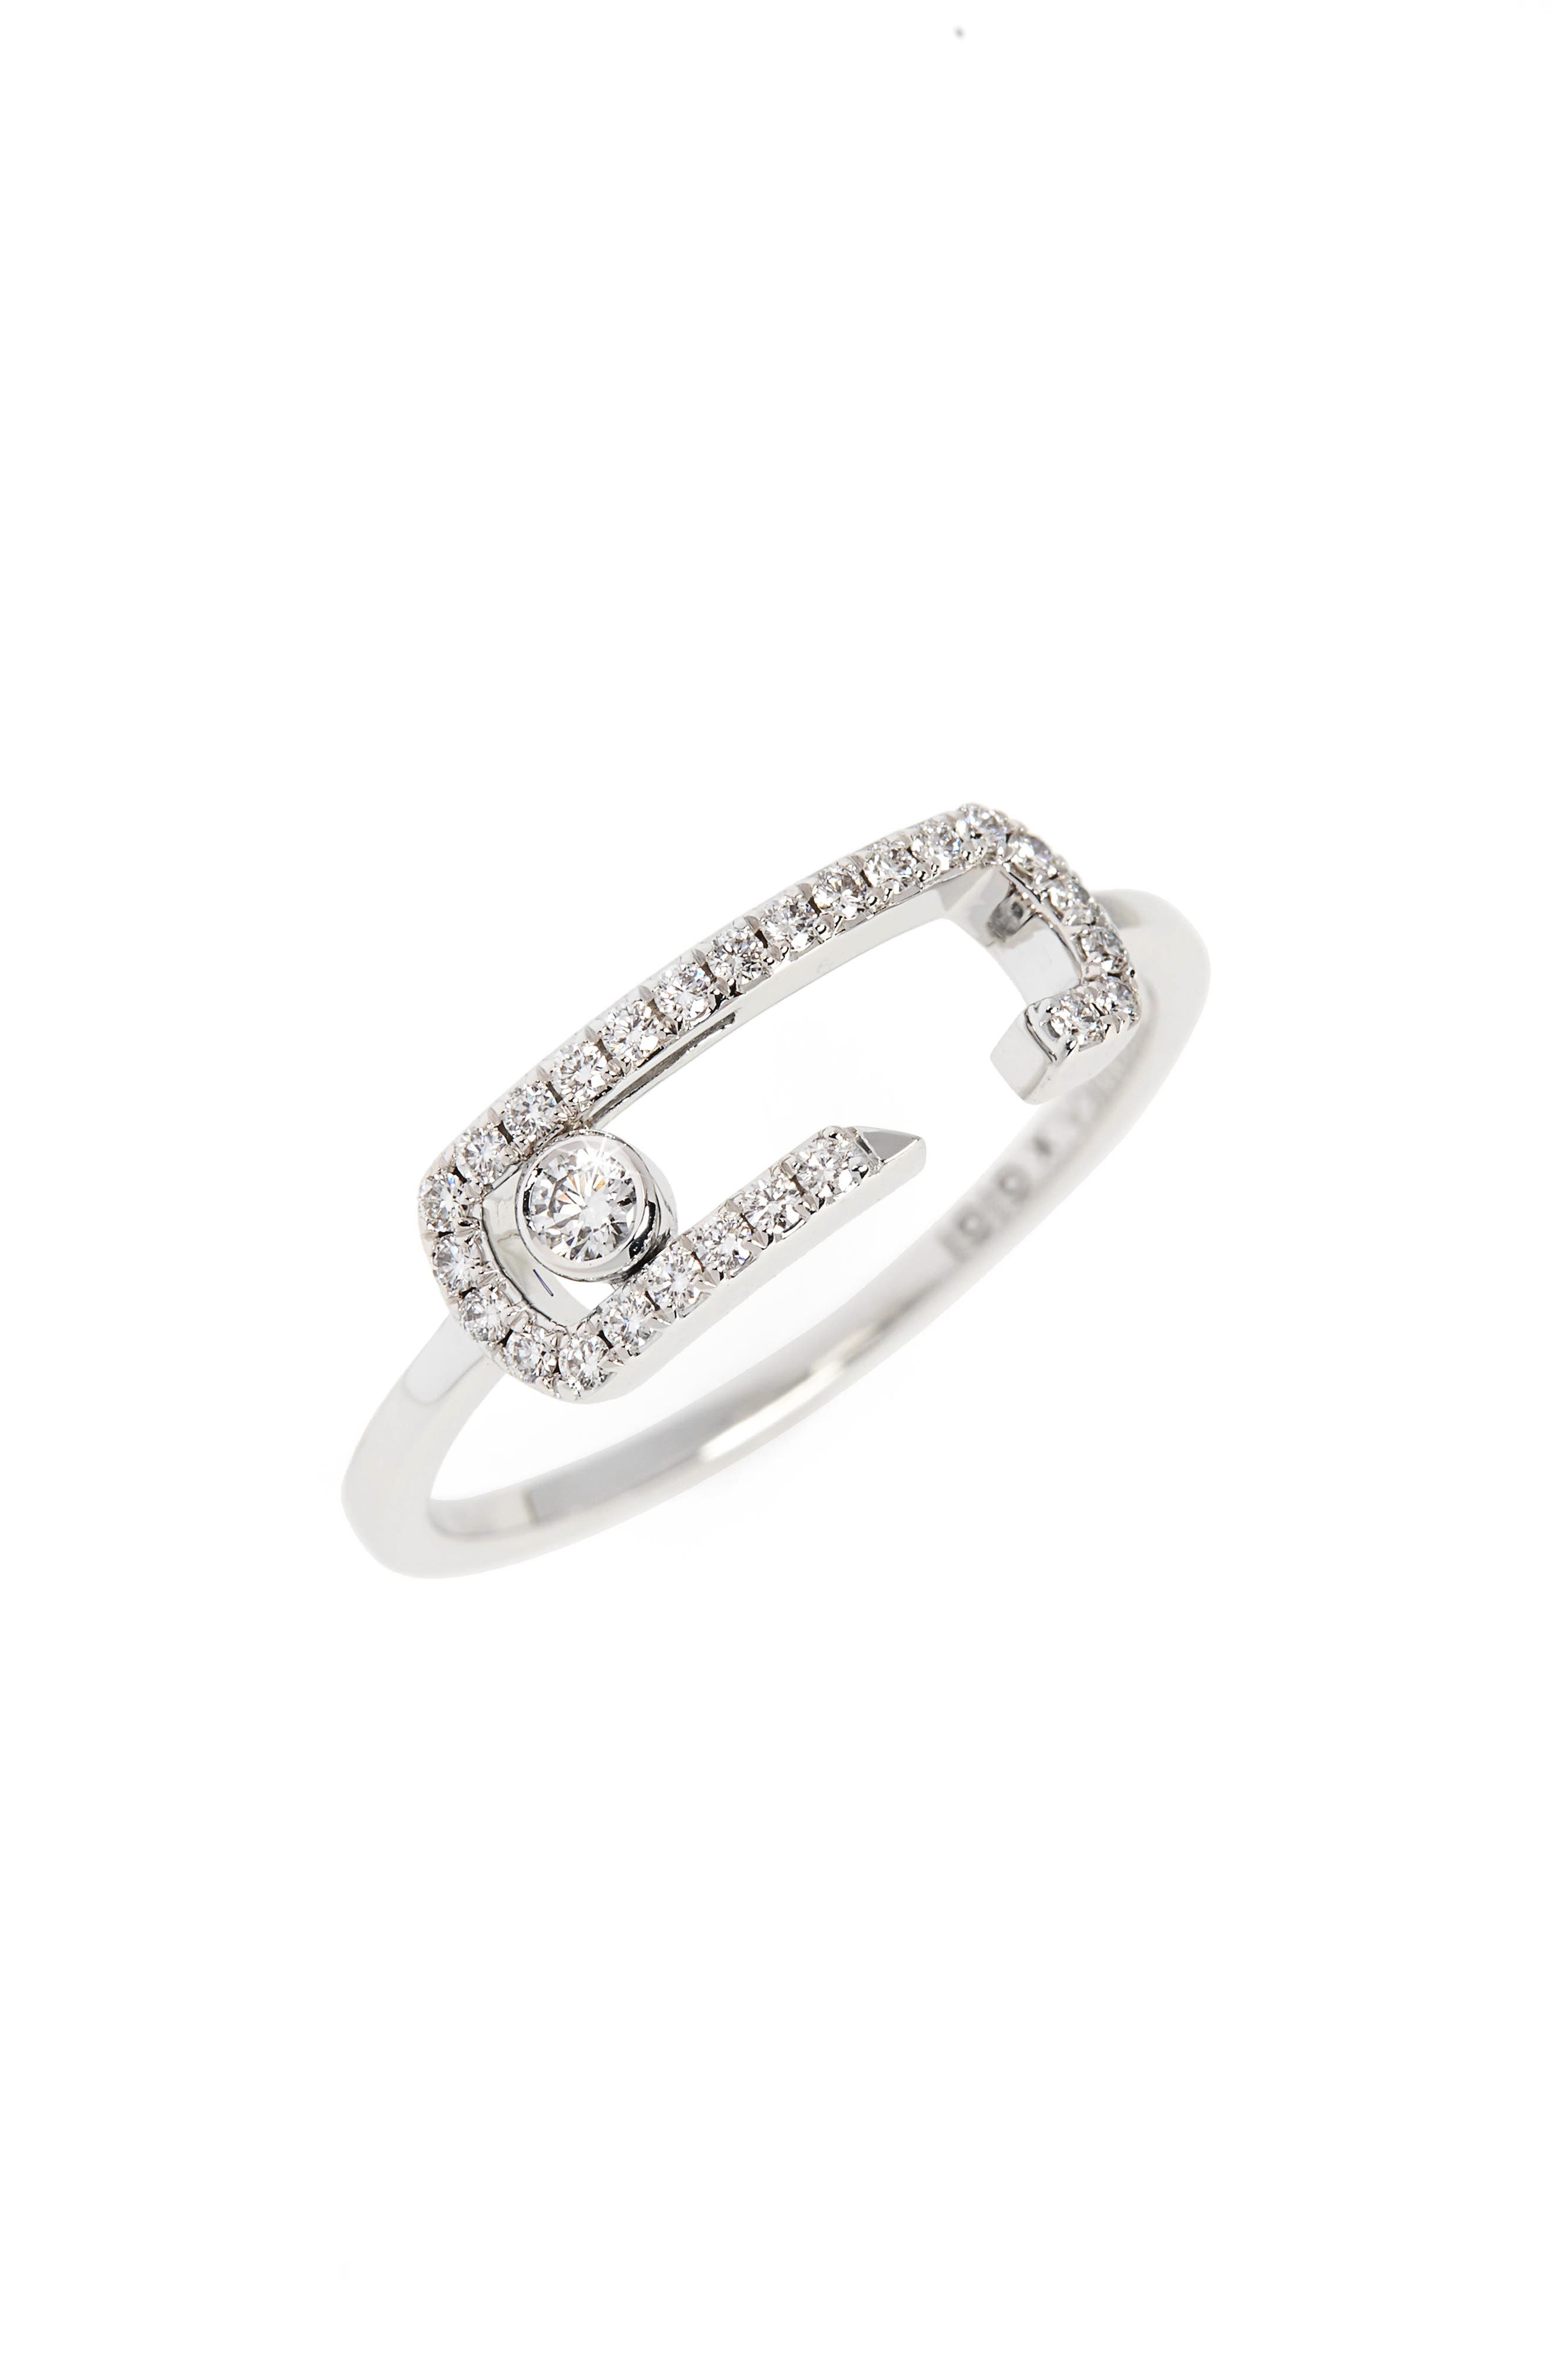 Move Addiction by Gigi Hadid Diamond Pavé Ring,                         Main,                         color, WHITE GOLD